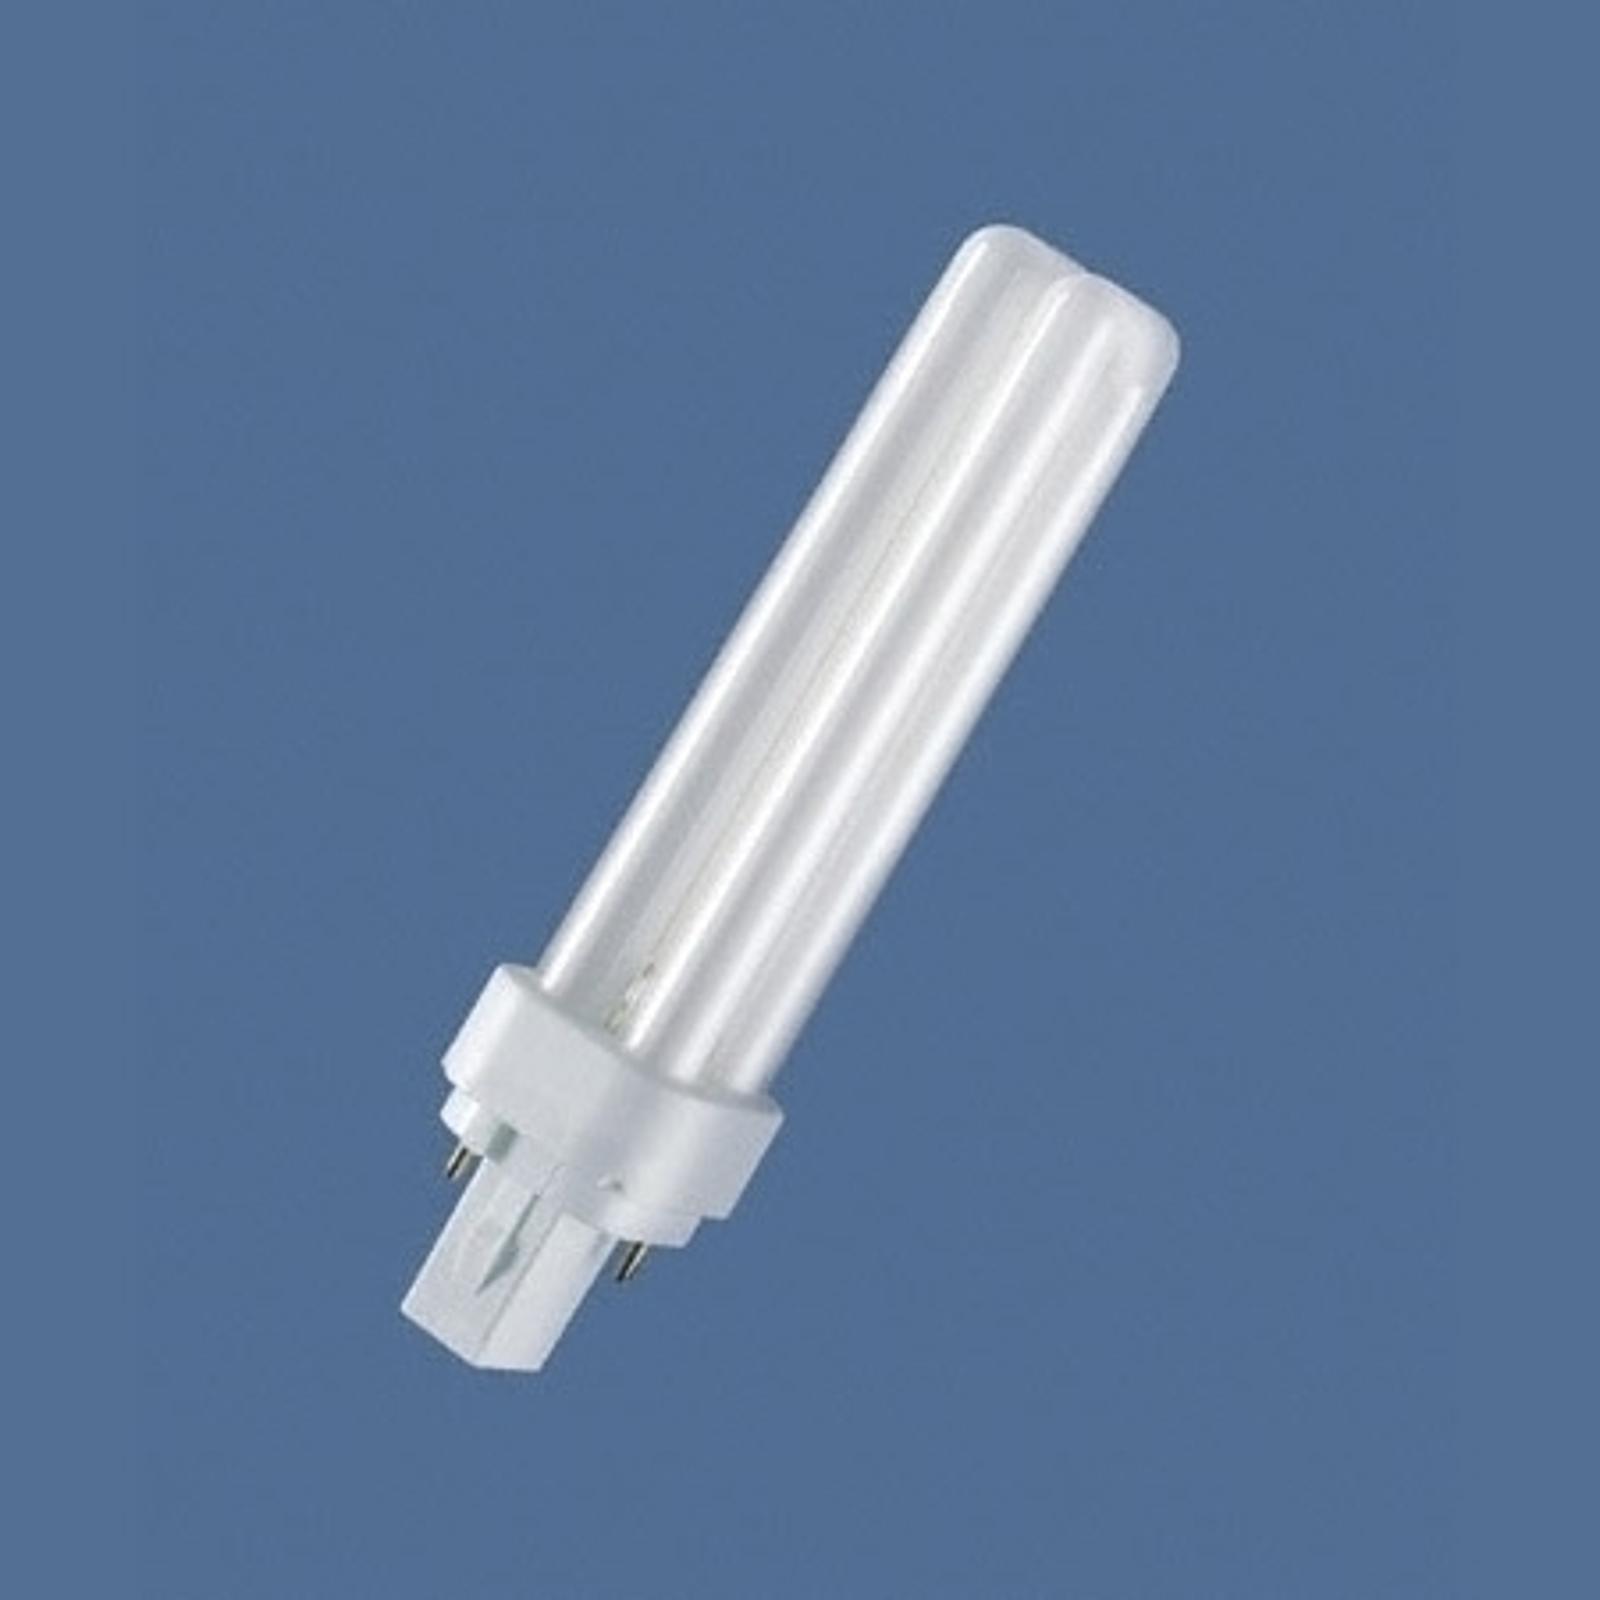 G24d 13W 840 Kompaktleuchtstofflampe Dulux D